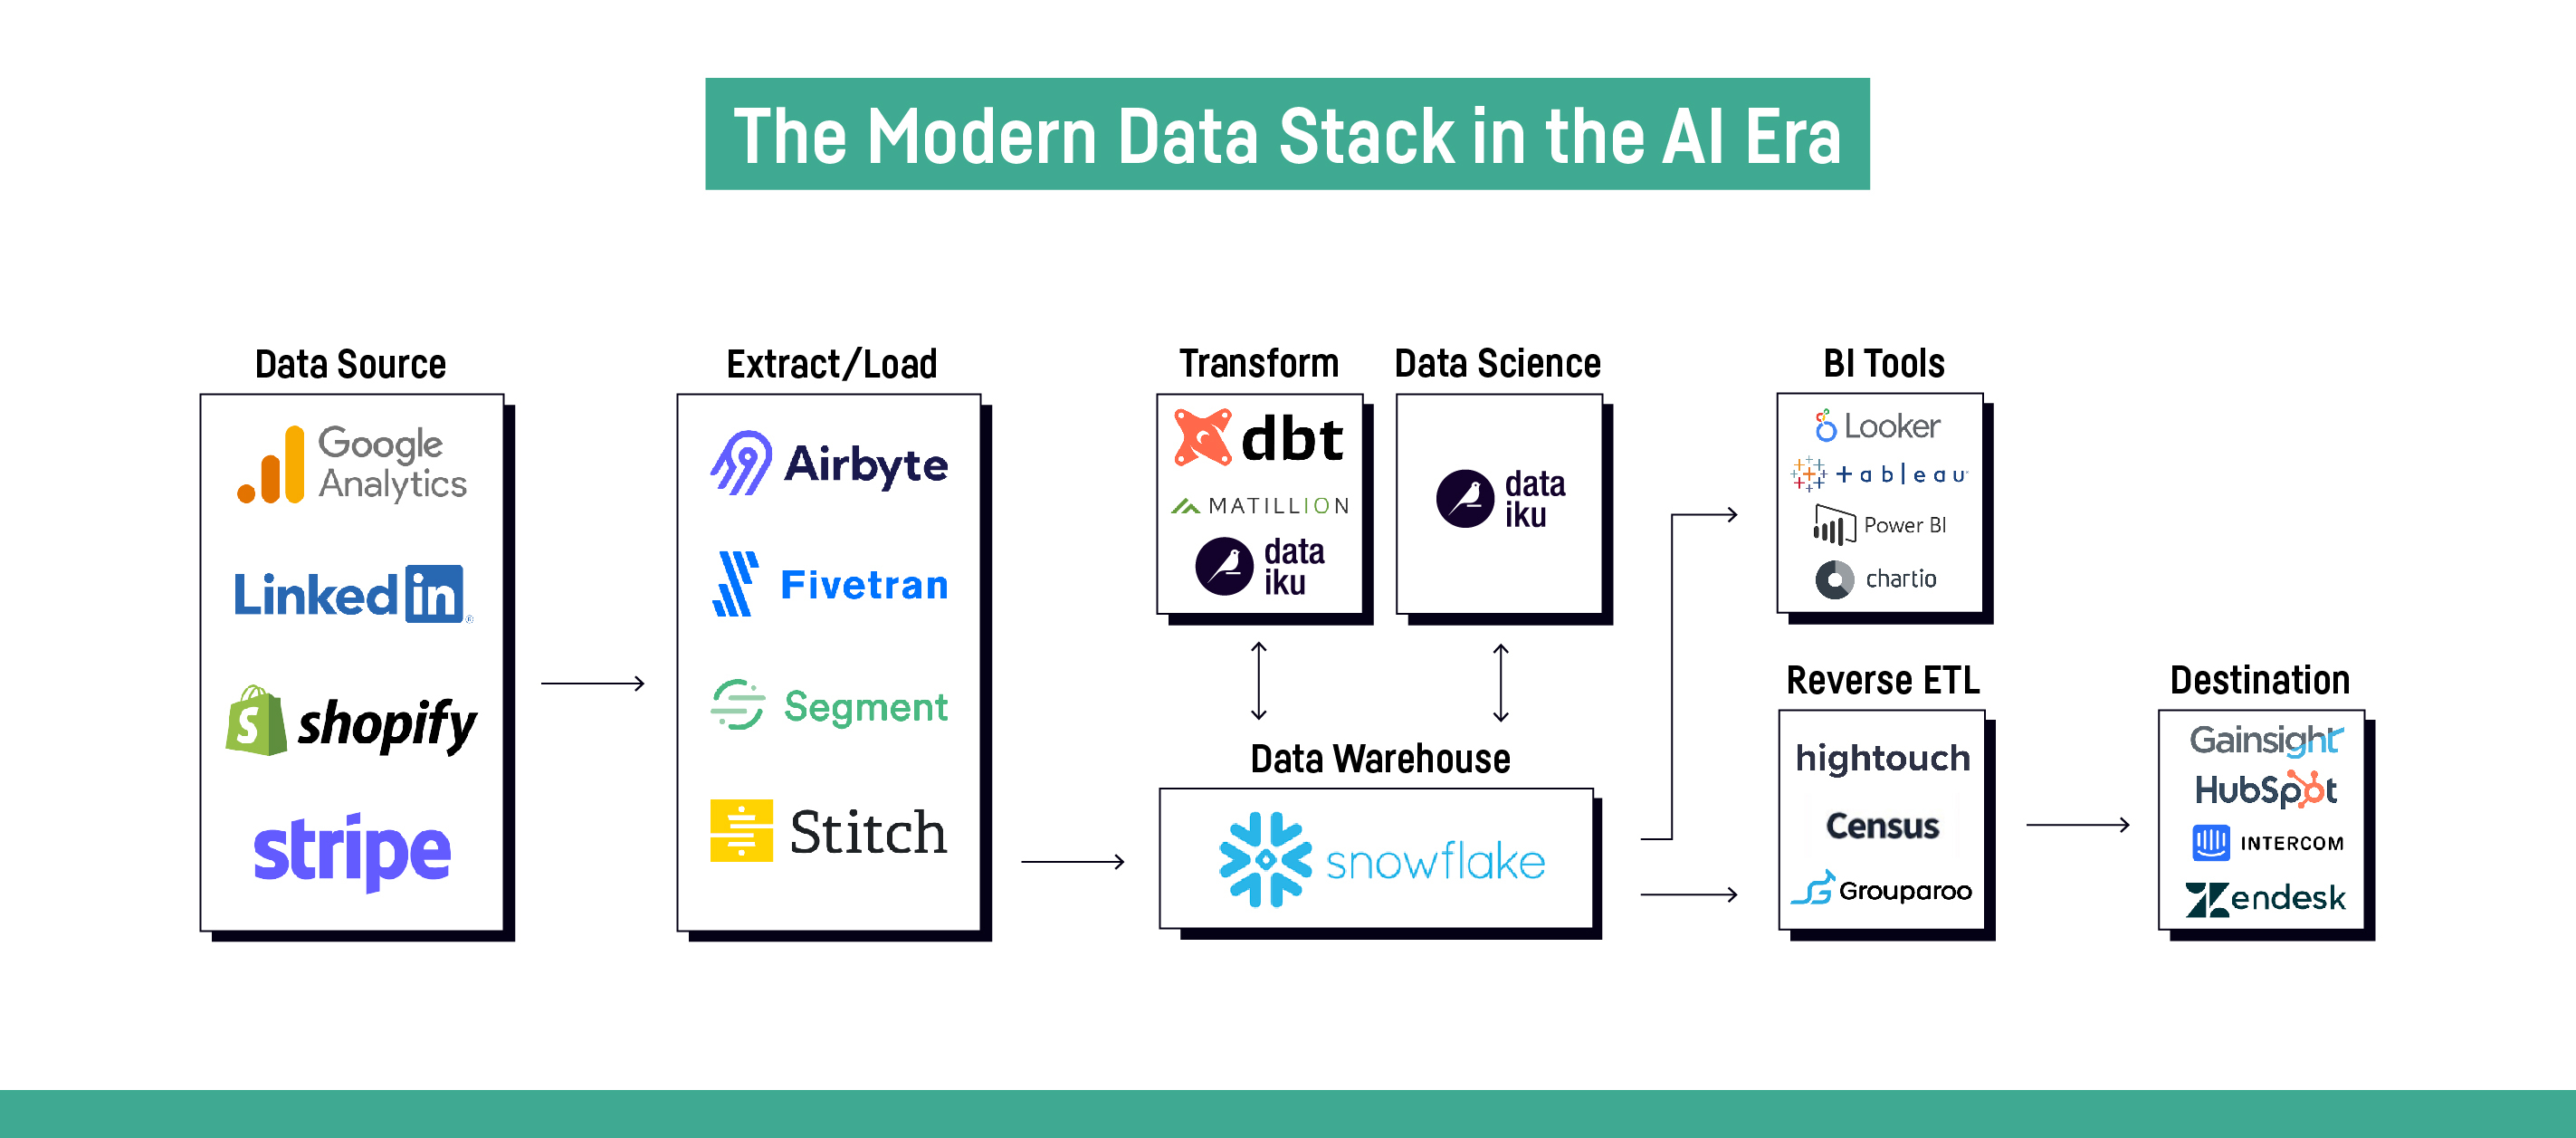 GM2108-DAC+The+Modern+Data+Stack+in+the+ML-AI+Era_v4 (1)